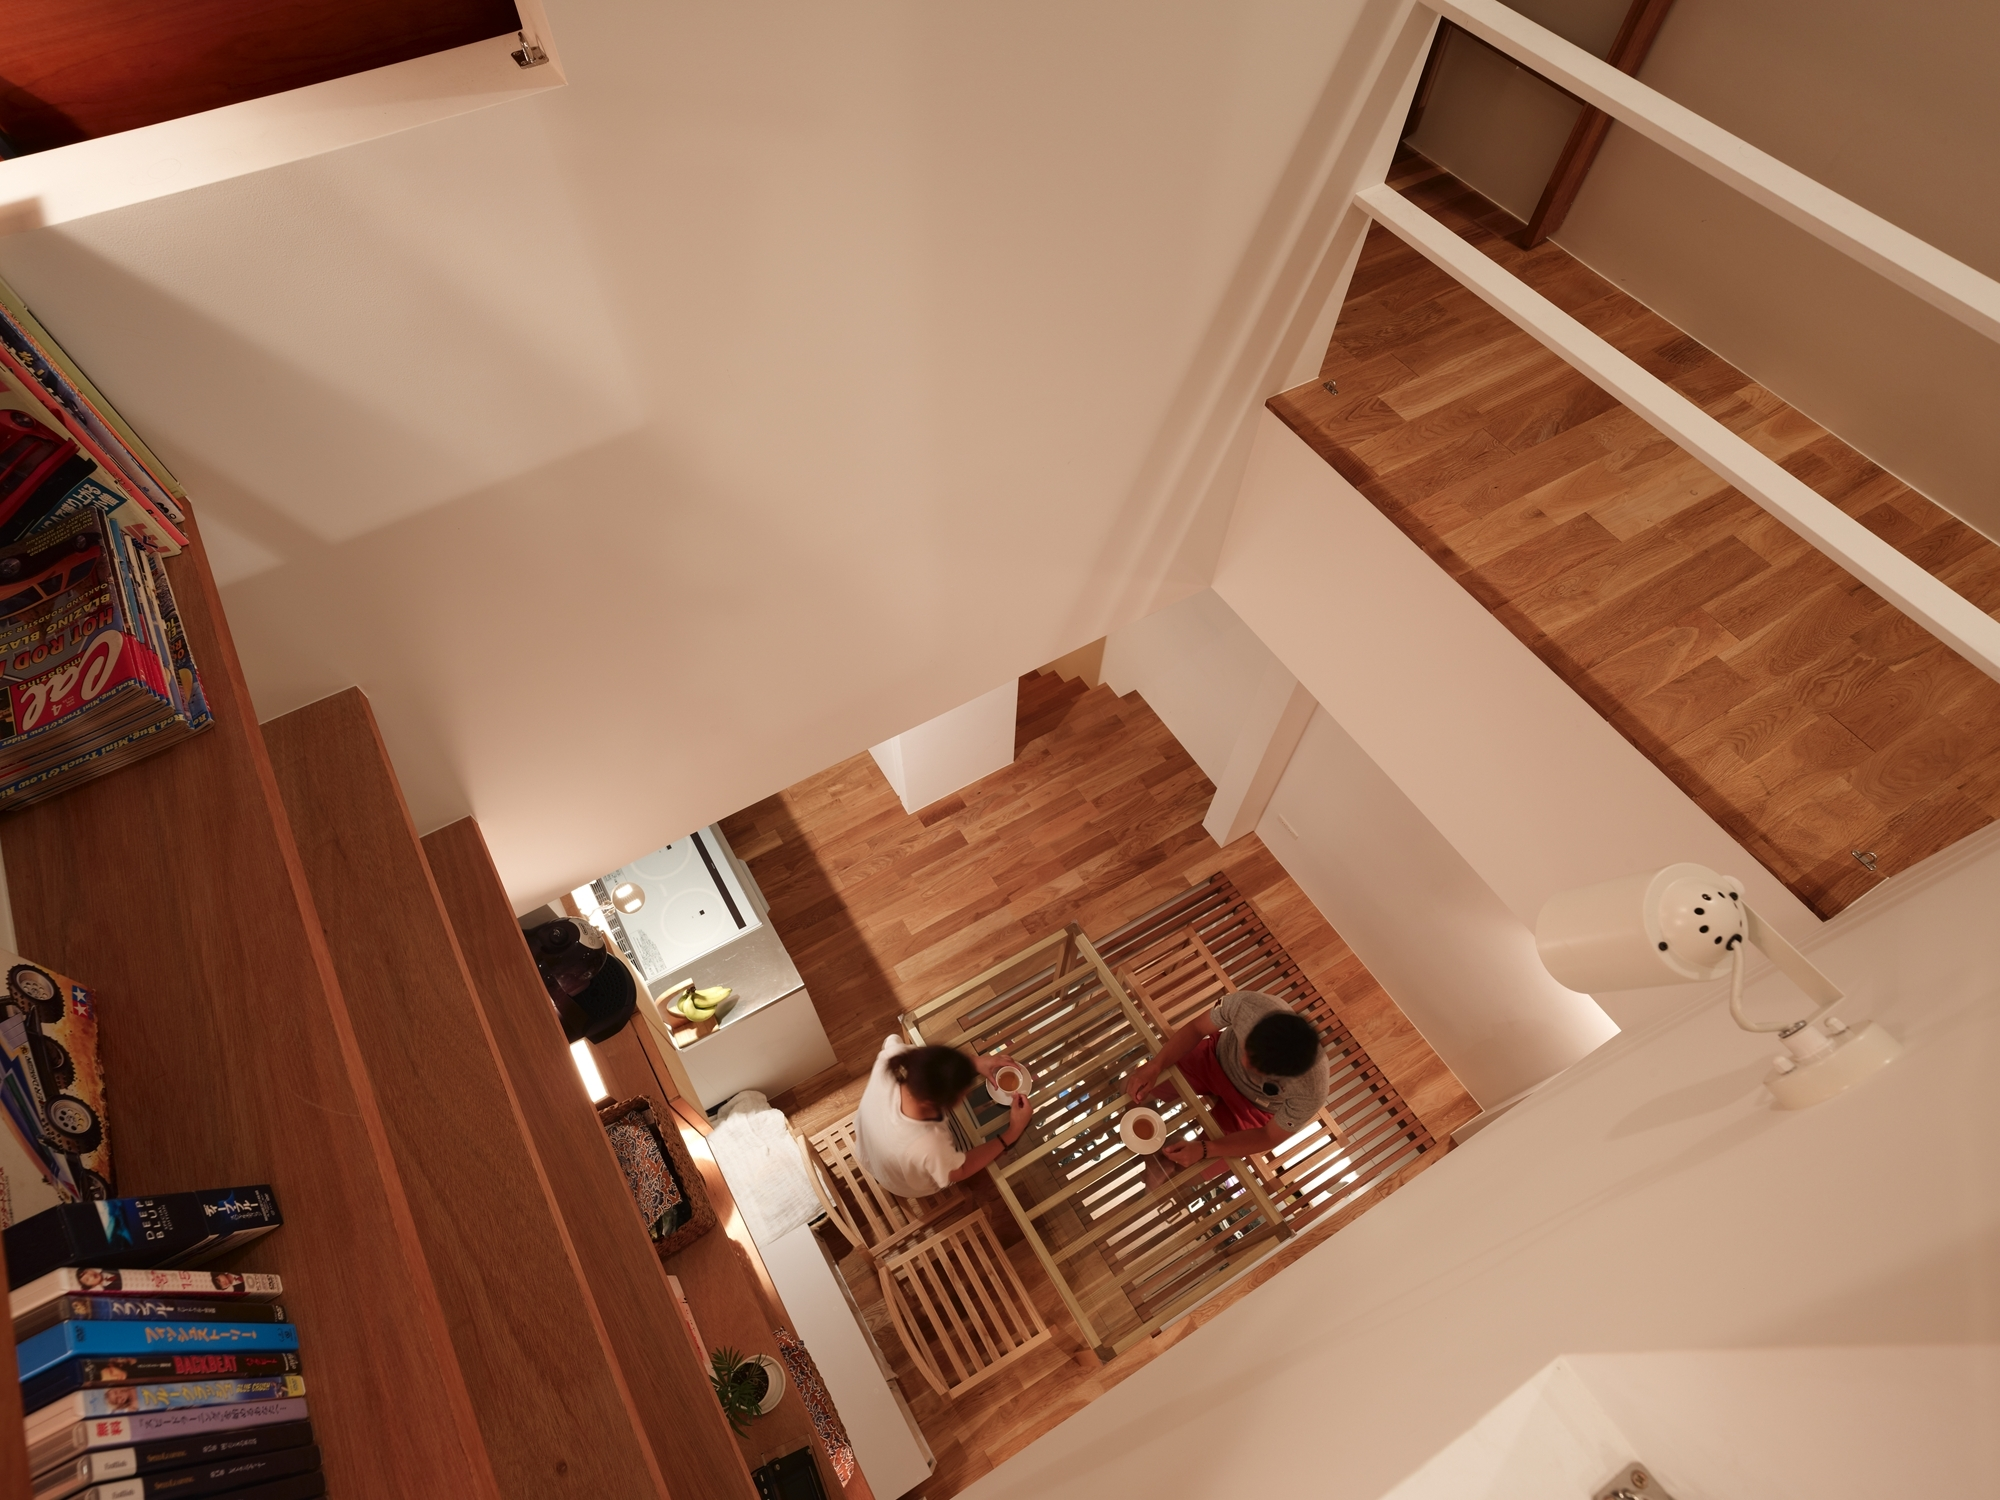 5144f2f5b3fc4baa2c00007a_house-in-nada-fujiwarramuro-architects_oishi217212000